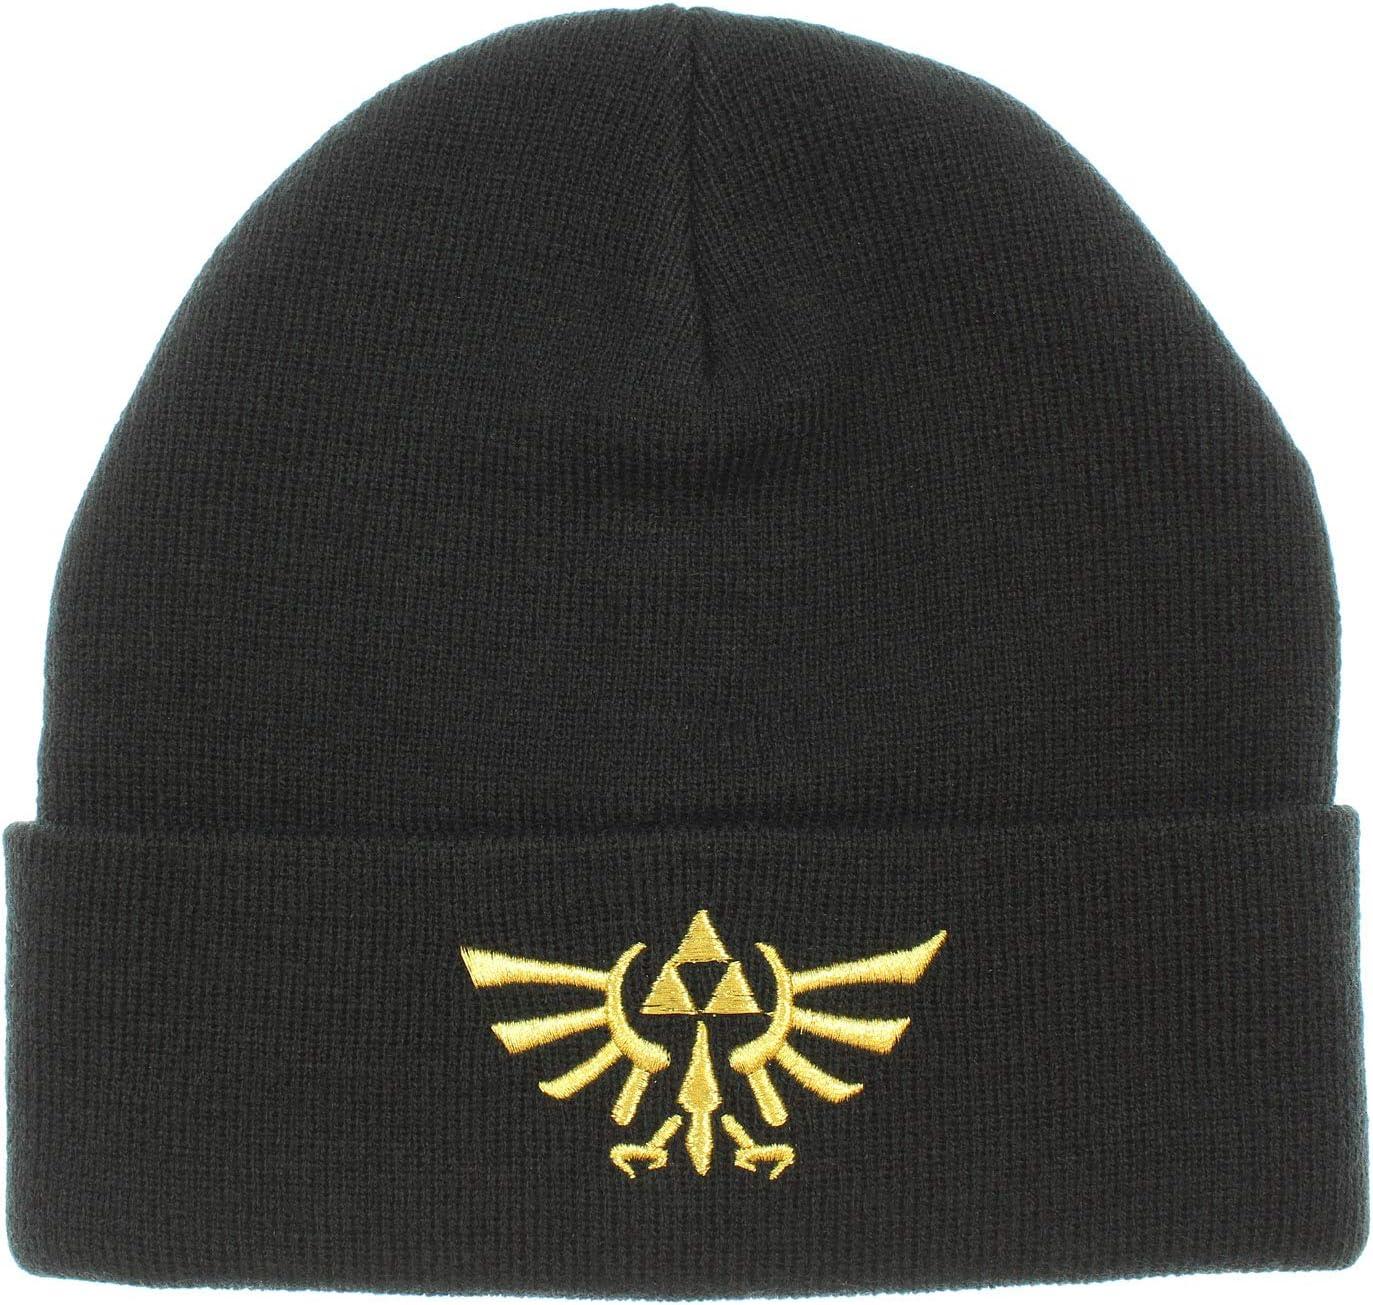 Bioworld Legend of Zelda Wingcrest Triforce Knit Cuff Beanie Hat Cap Men Women Black: Toys & Games